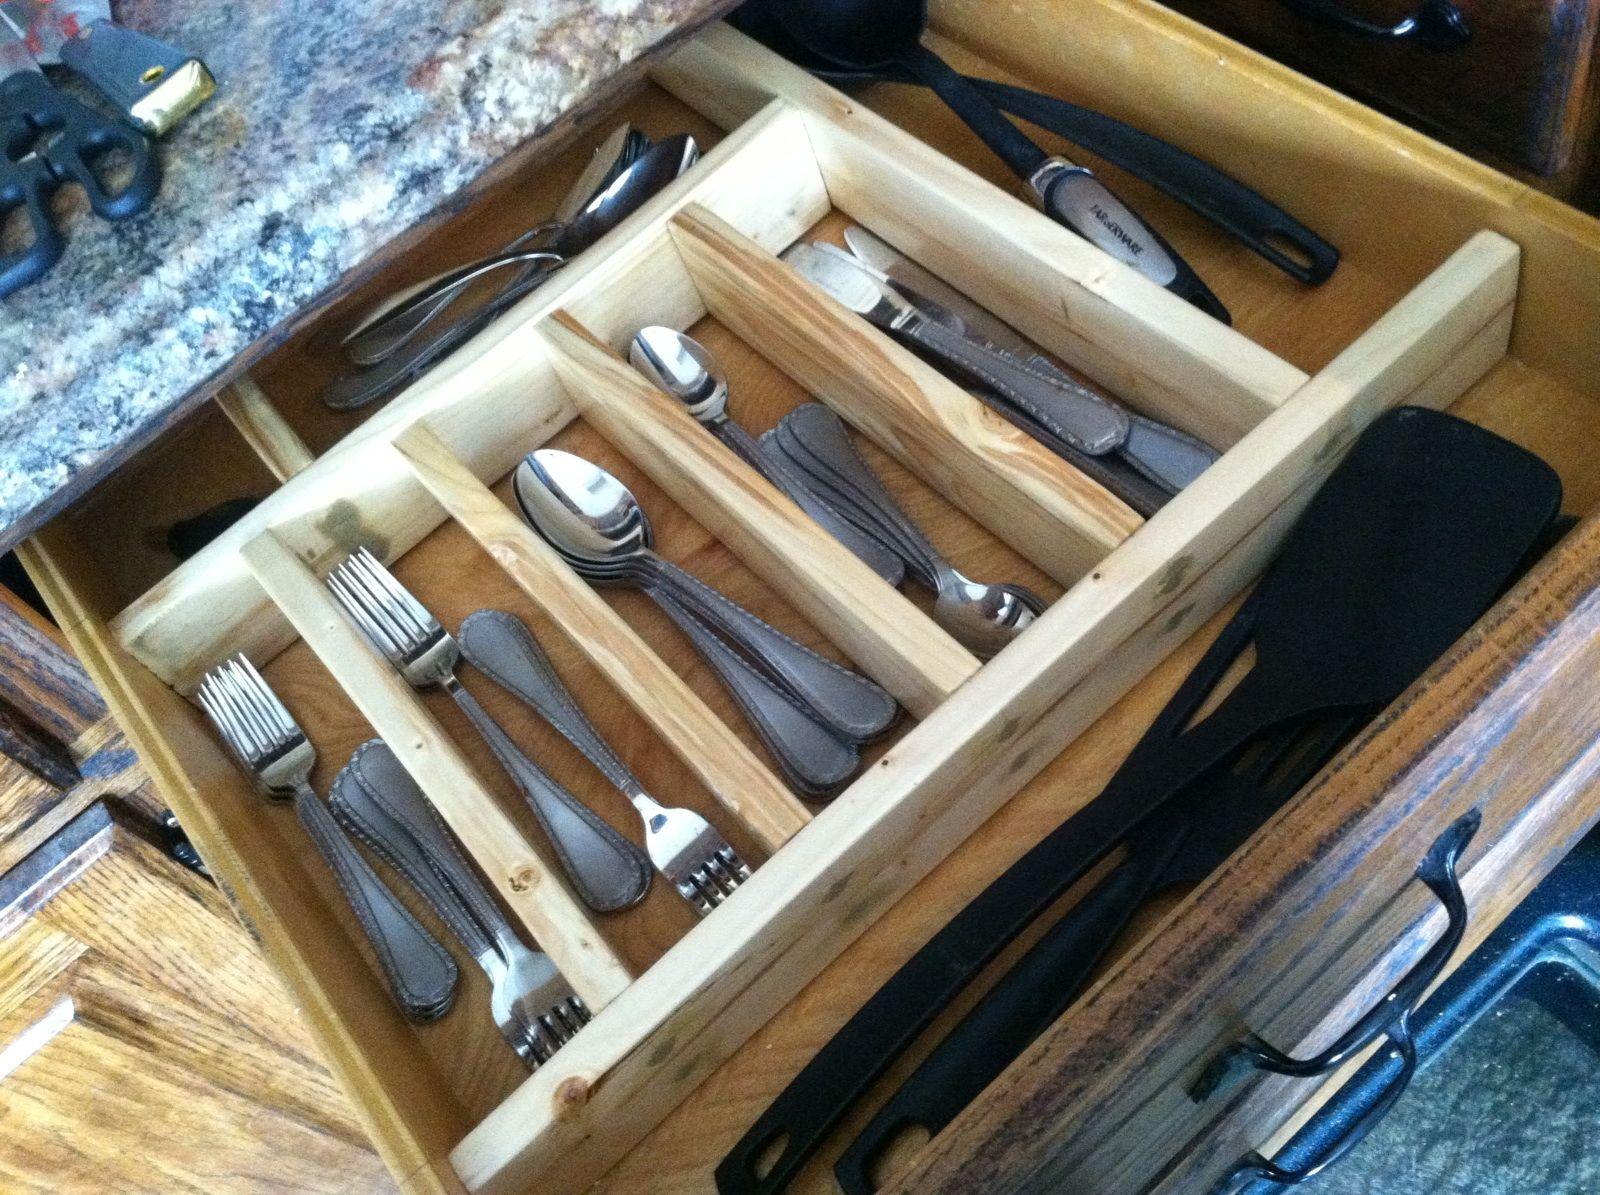 Kitchen drawer organizer kitchen drawer organizer amazon kitchen kitchen drawer organizer solutioingenieria Choice Image